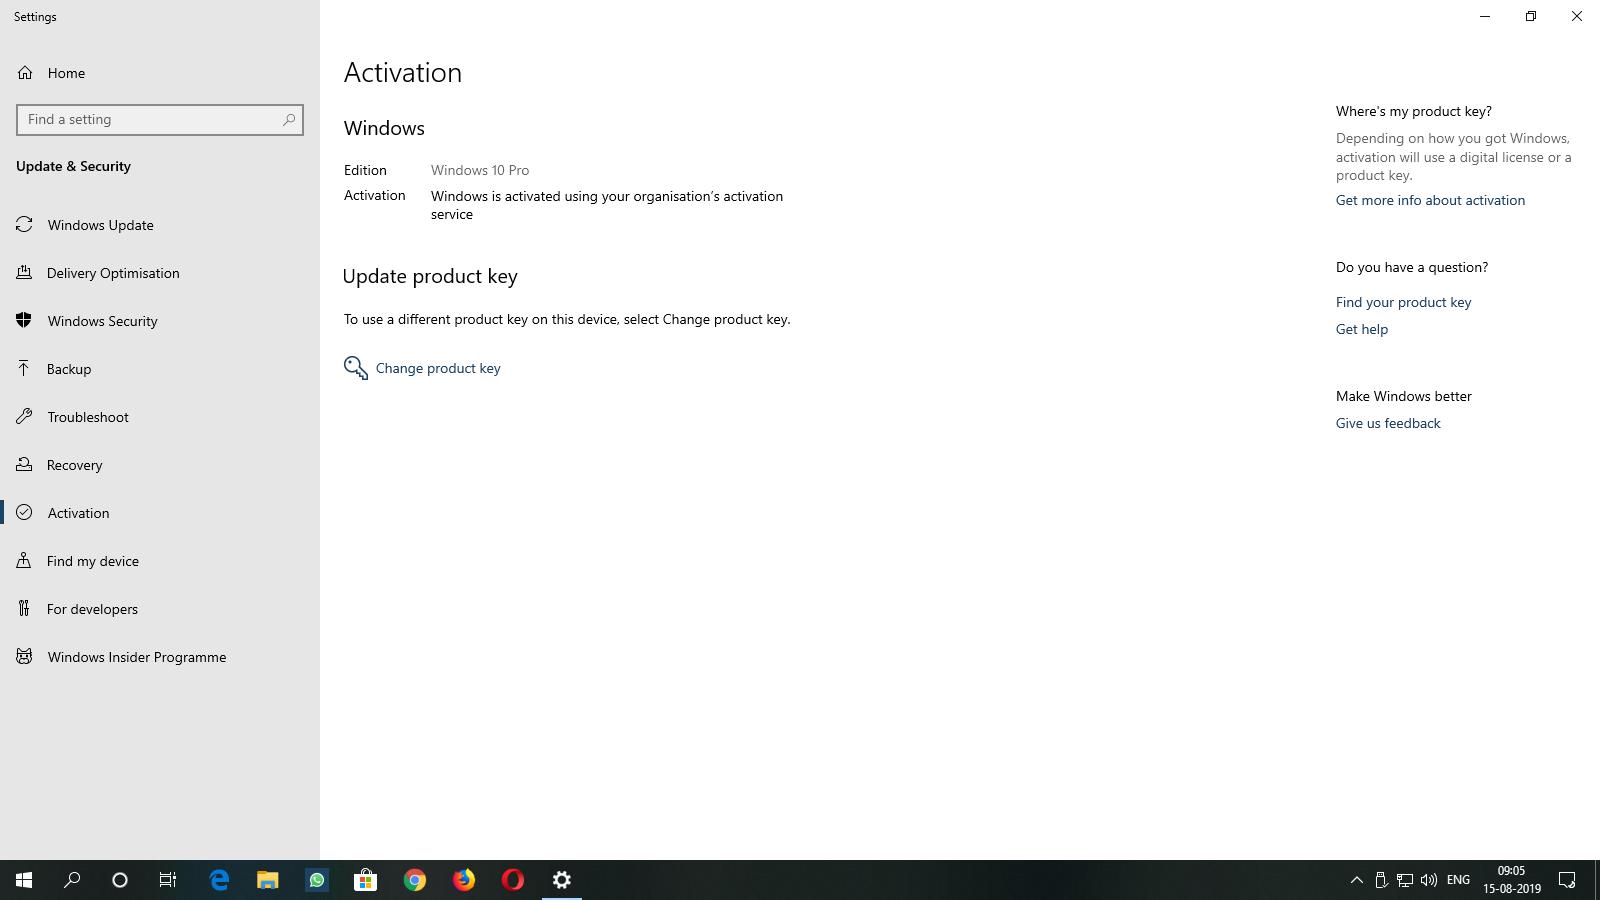 Windows 10 pro activation error 2367d4e5-8f91-4814-8257-7ef9bab0073a?upload=true.png